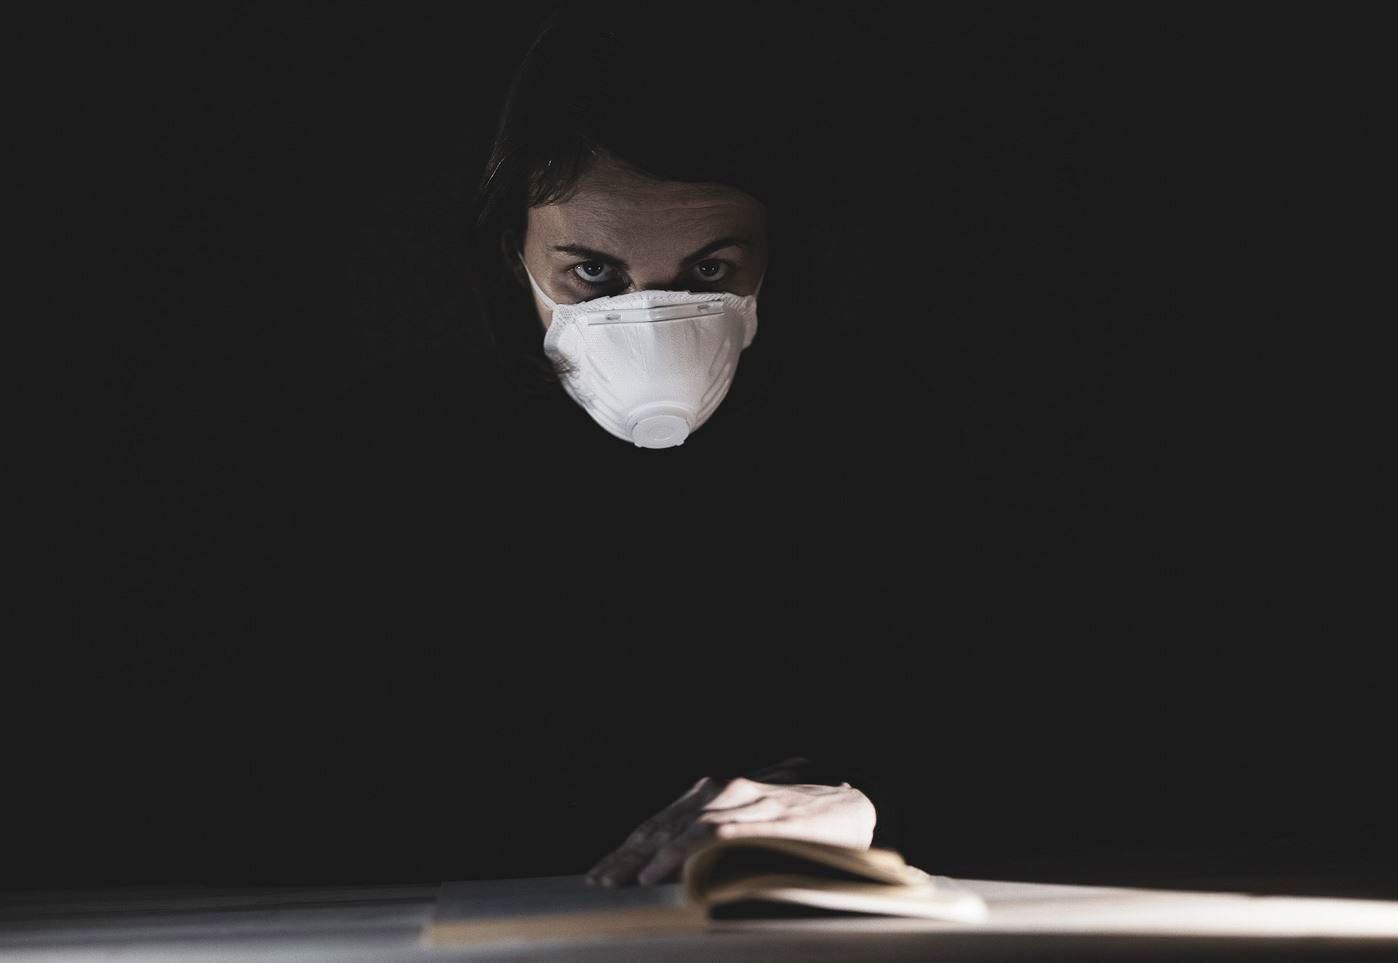 coronavirus mascherina pandemia legge libro donna preoccupata